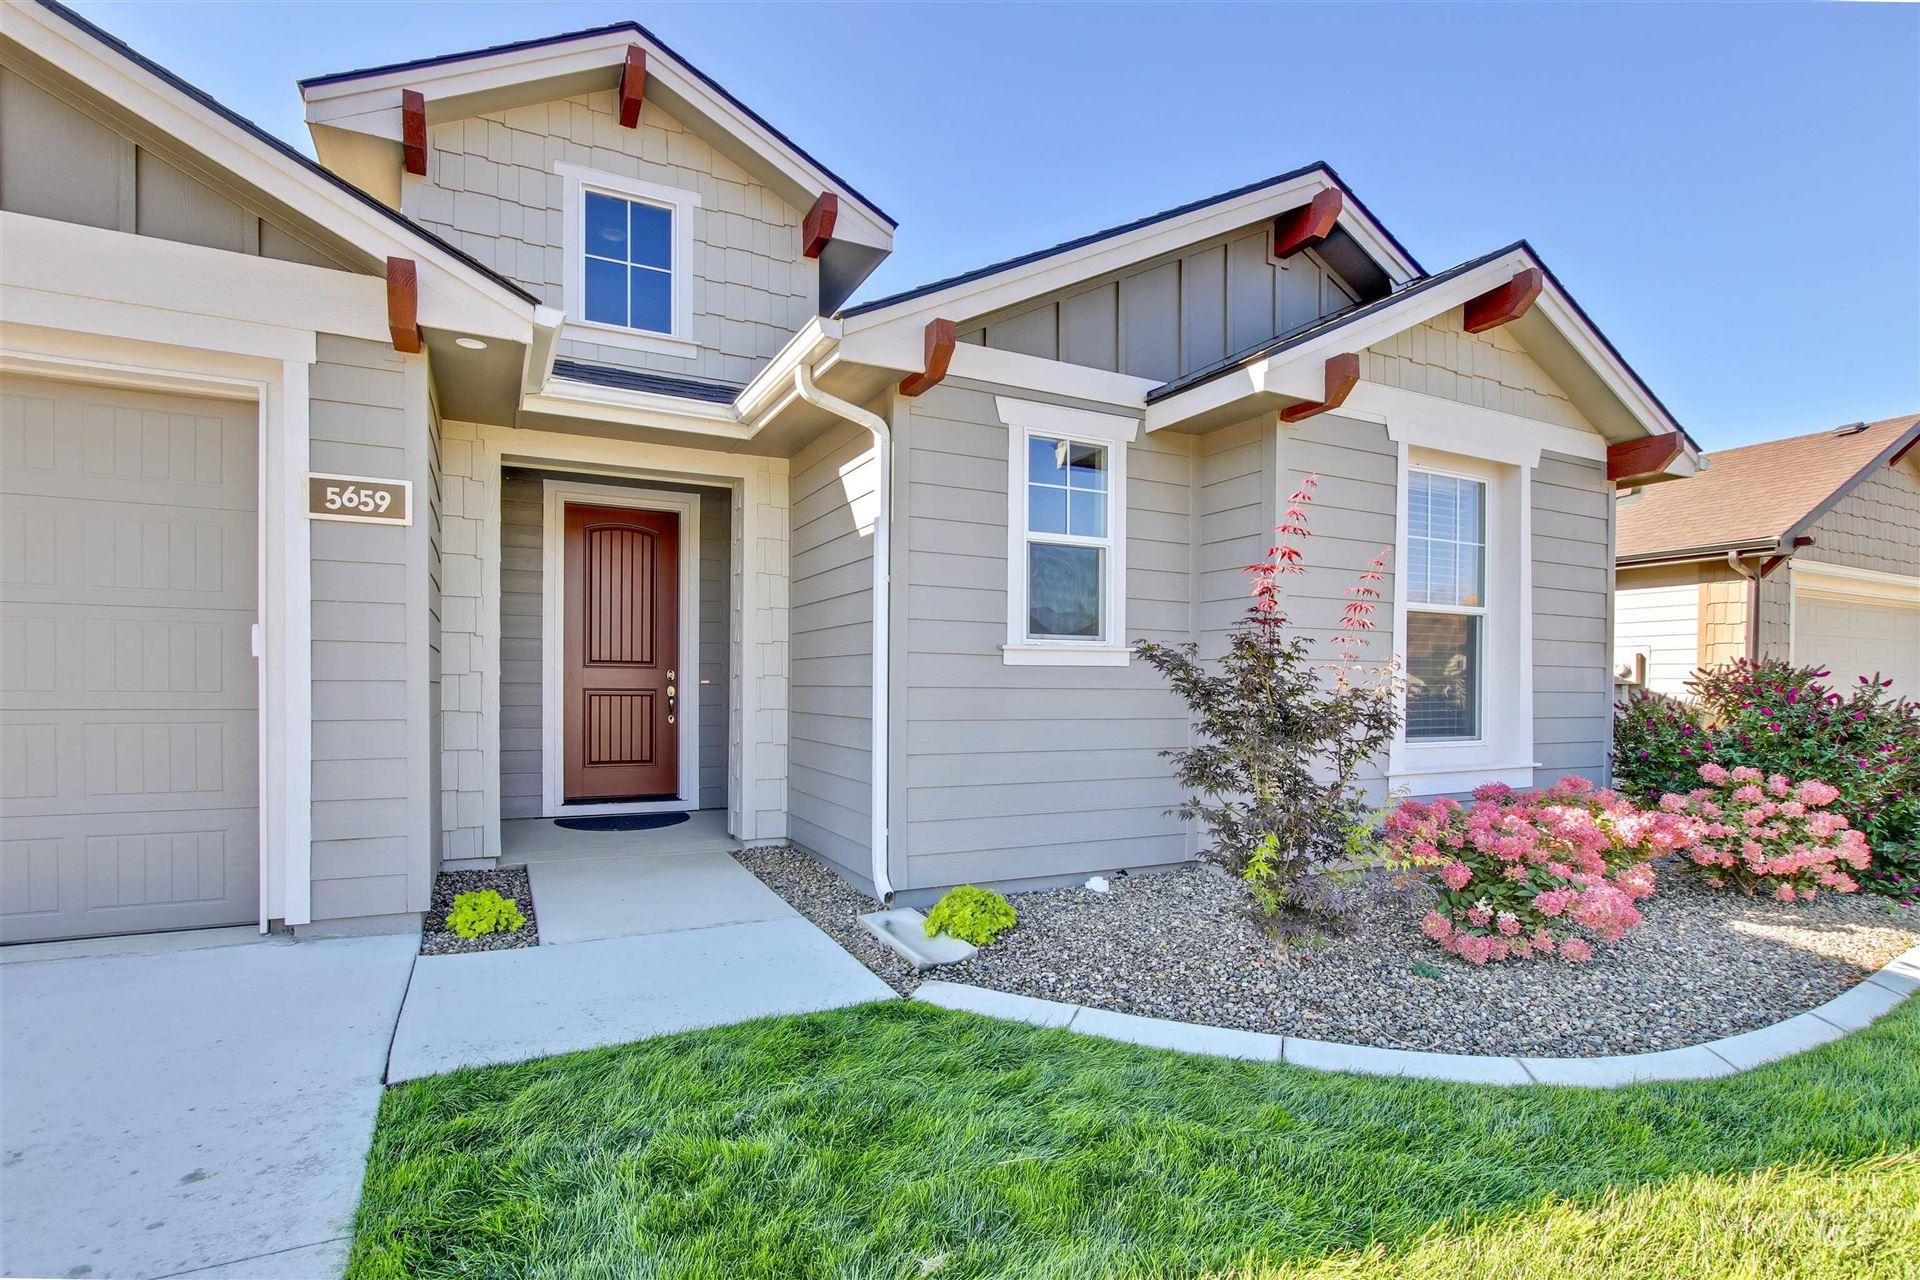 Photo of 5659 W Hopwood Street #533, Boise, ID 83714 (MLS # 98819555)